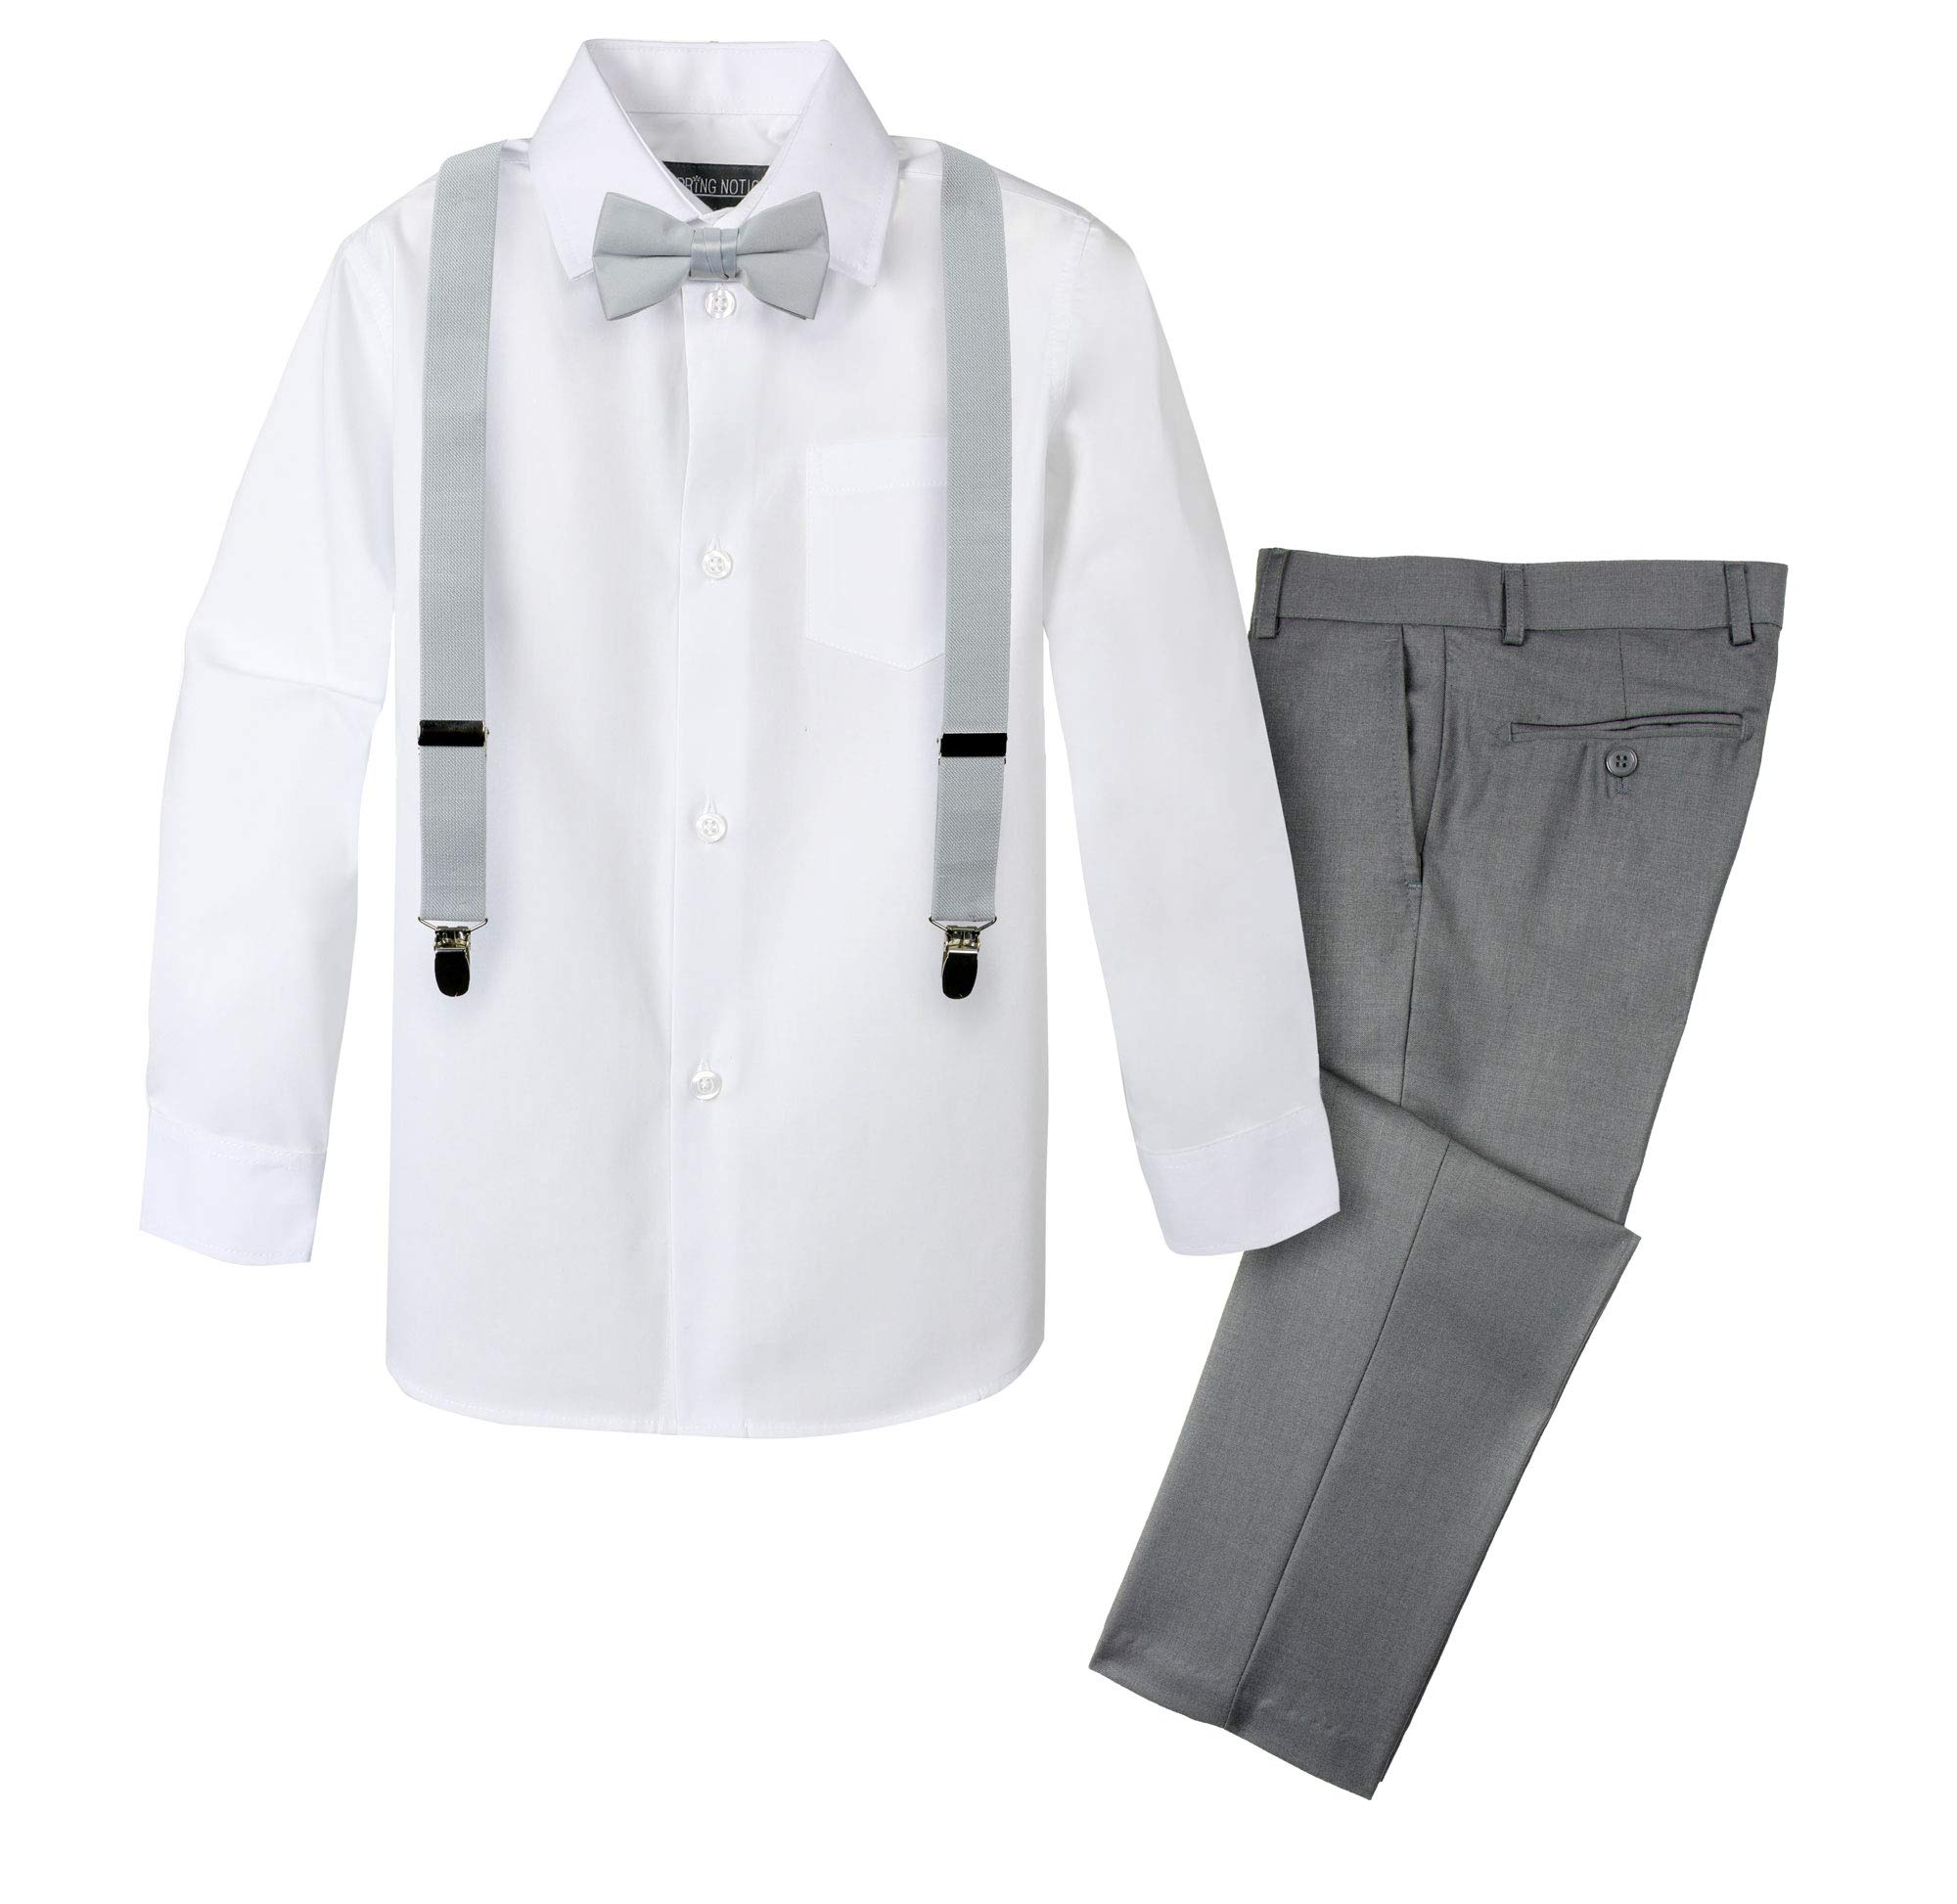 Spring Notion Boys' 4-Piece Suspender Outfit 3T Grey/Grey